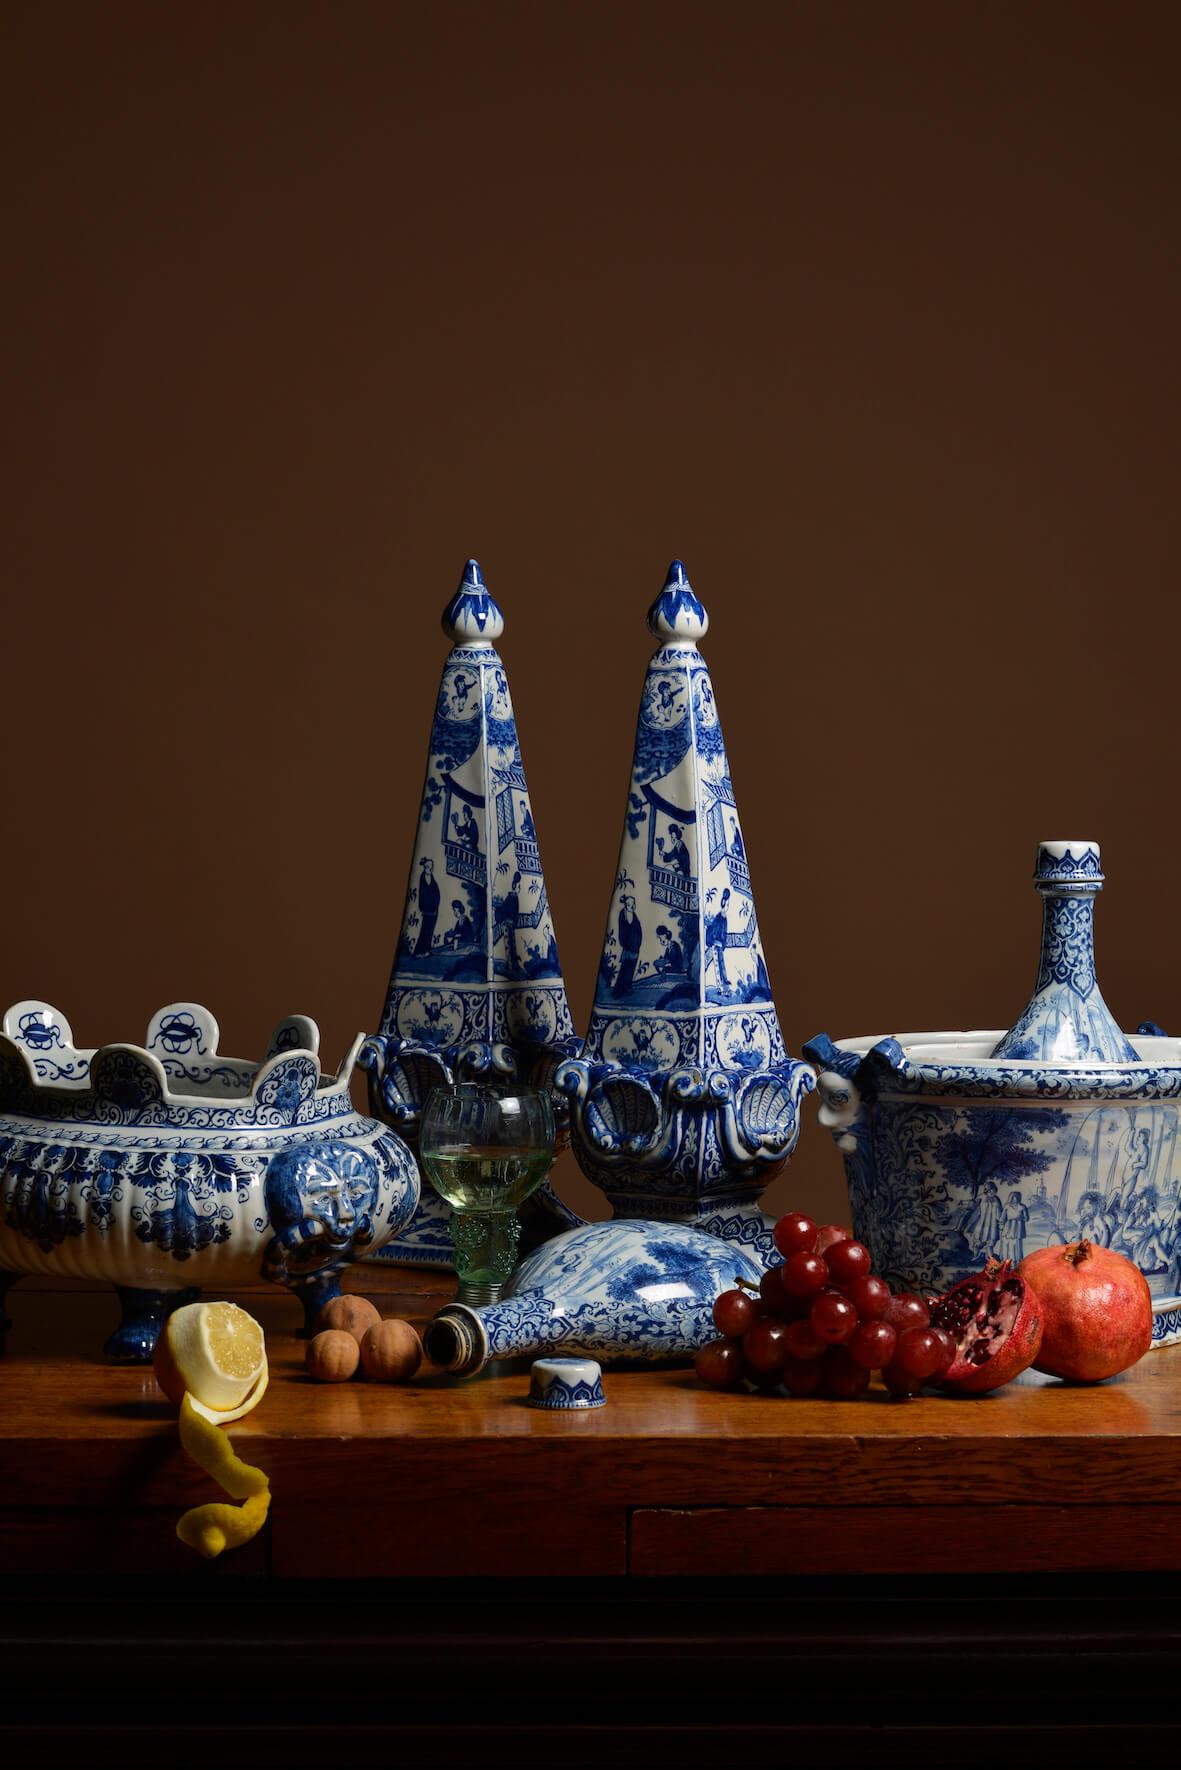 'Sur La Table' In The 17th & 18th Century